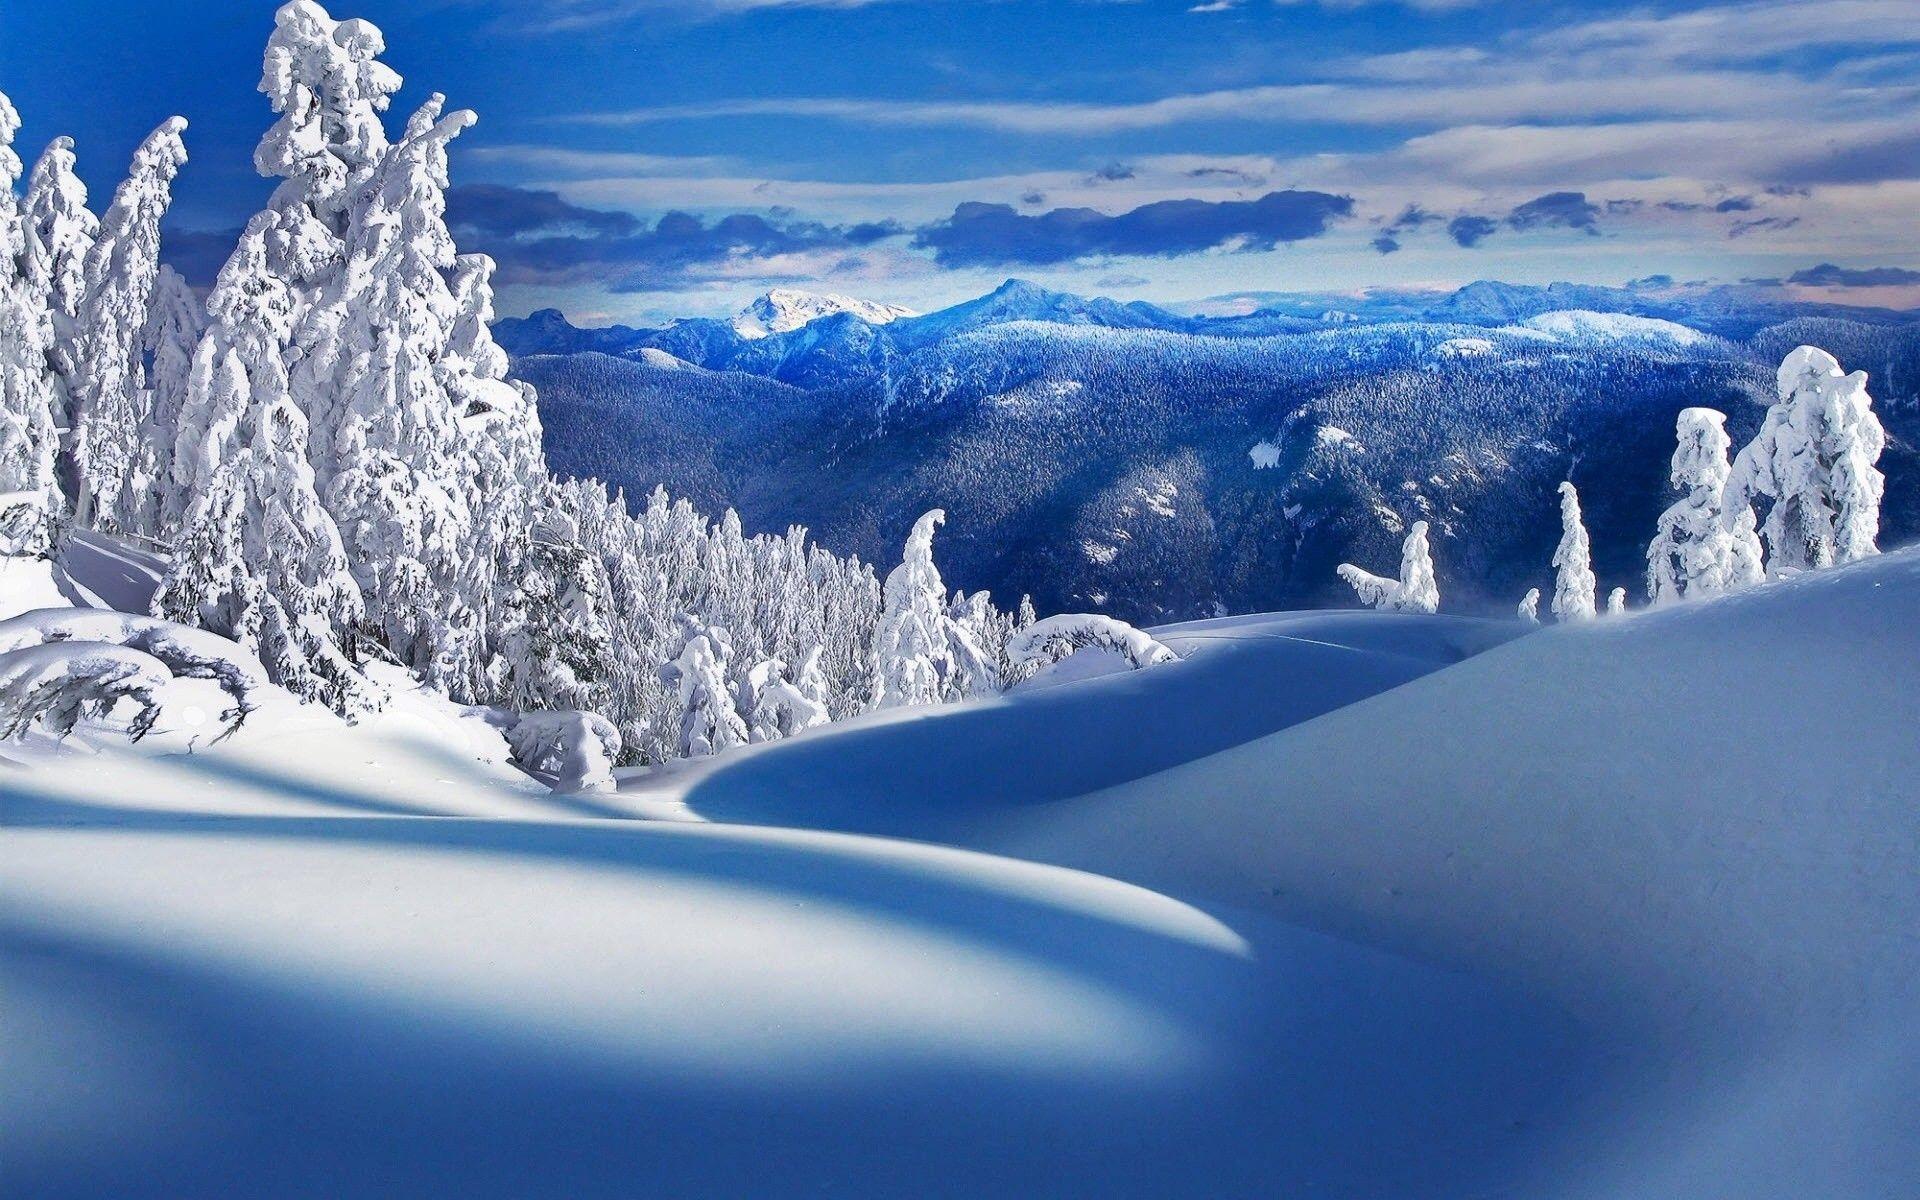 Snow Scenes Wallpaper